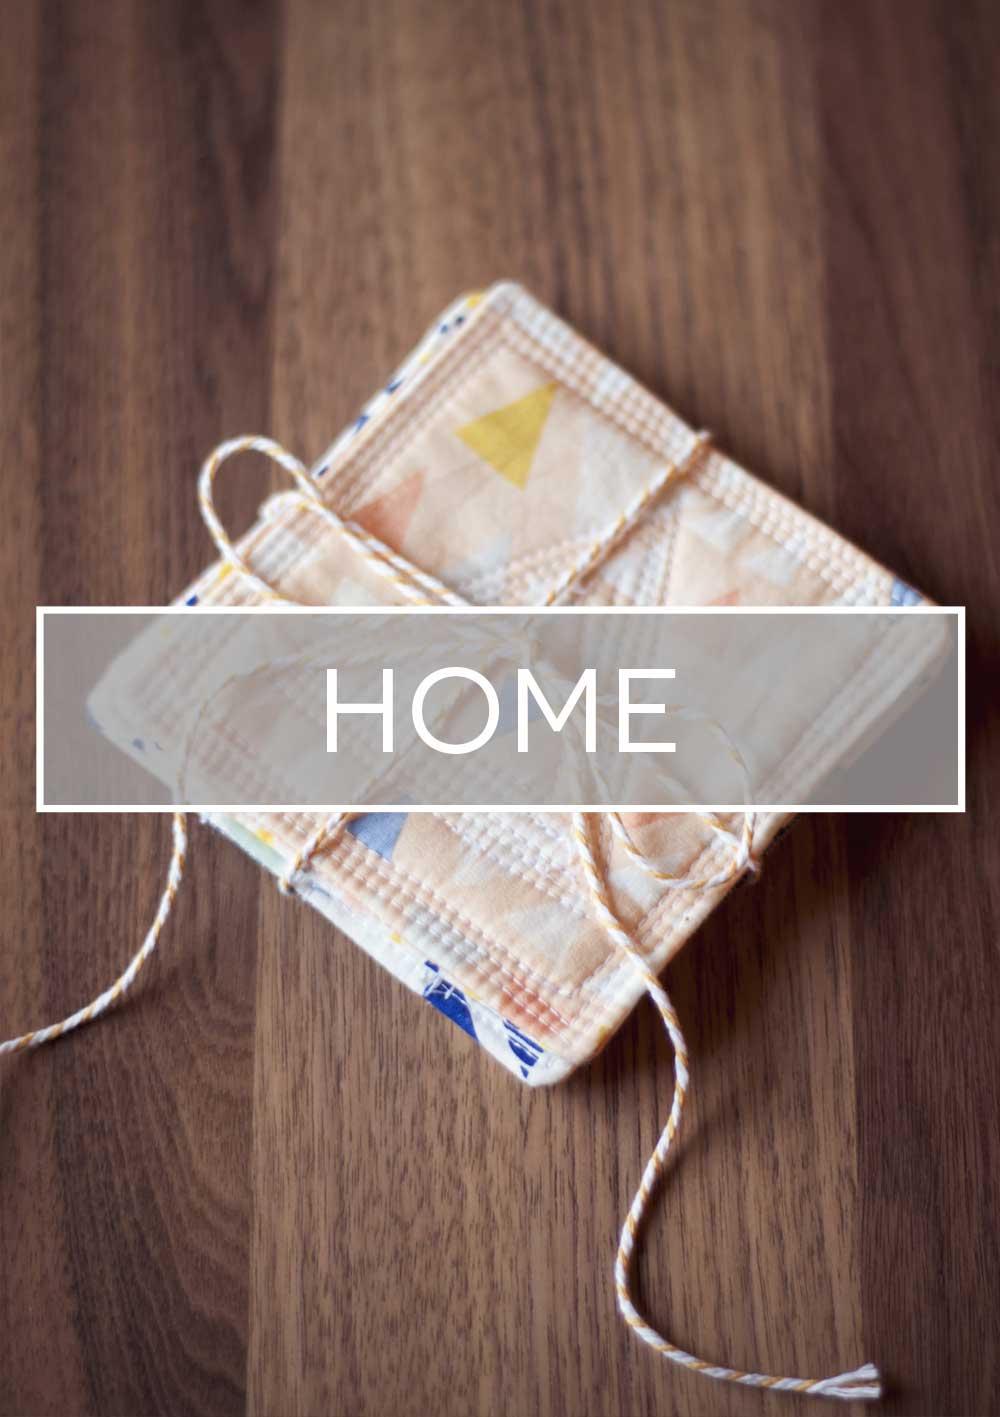 Home Tutorials on VeryShannon.com!